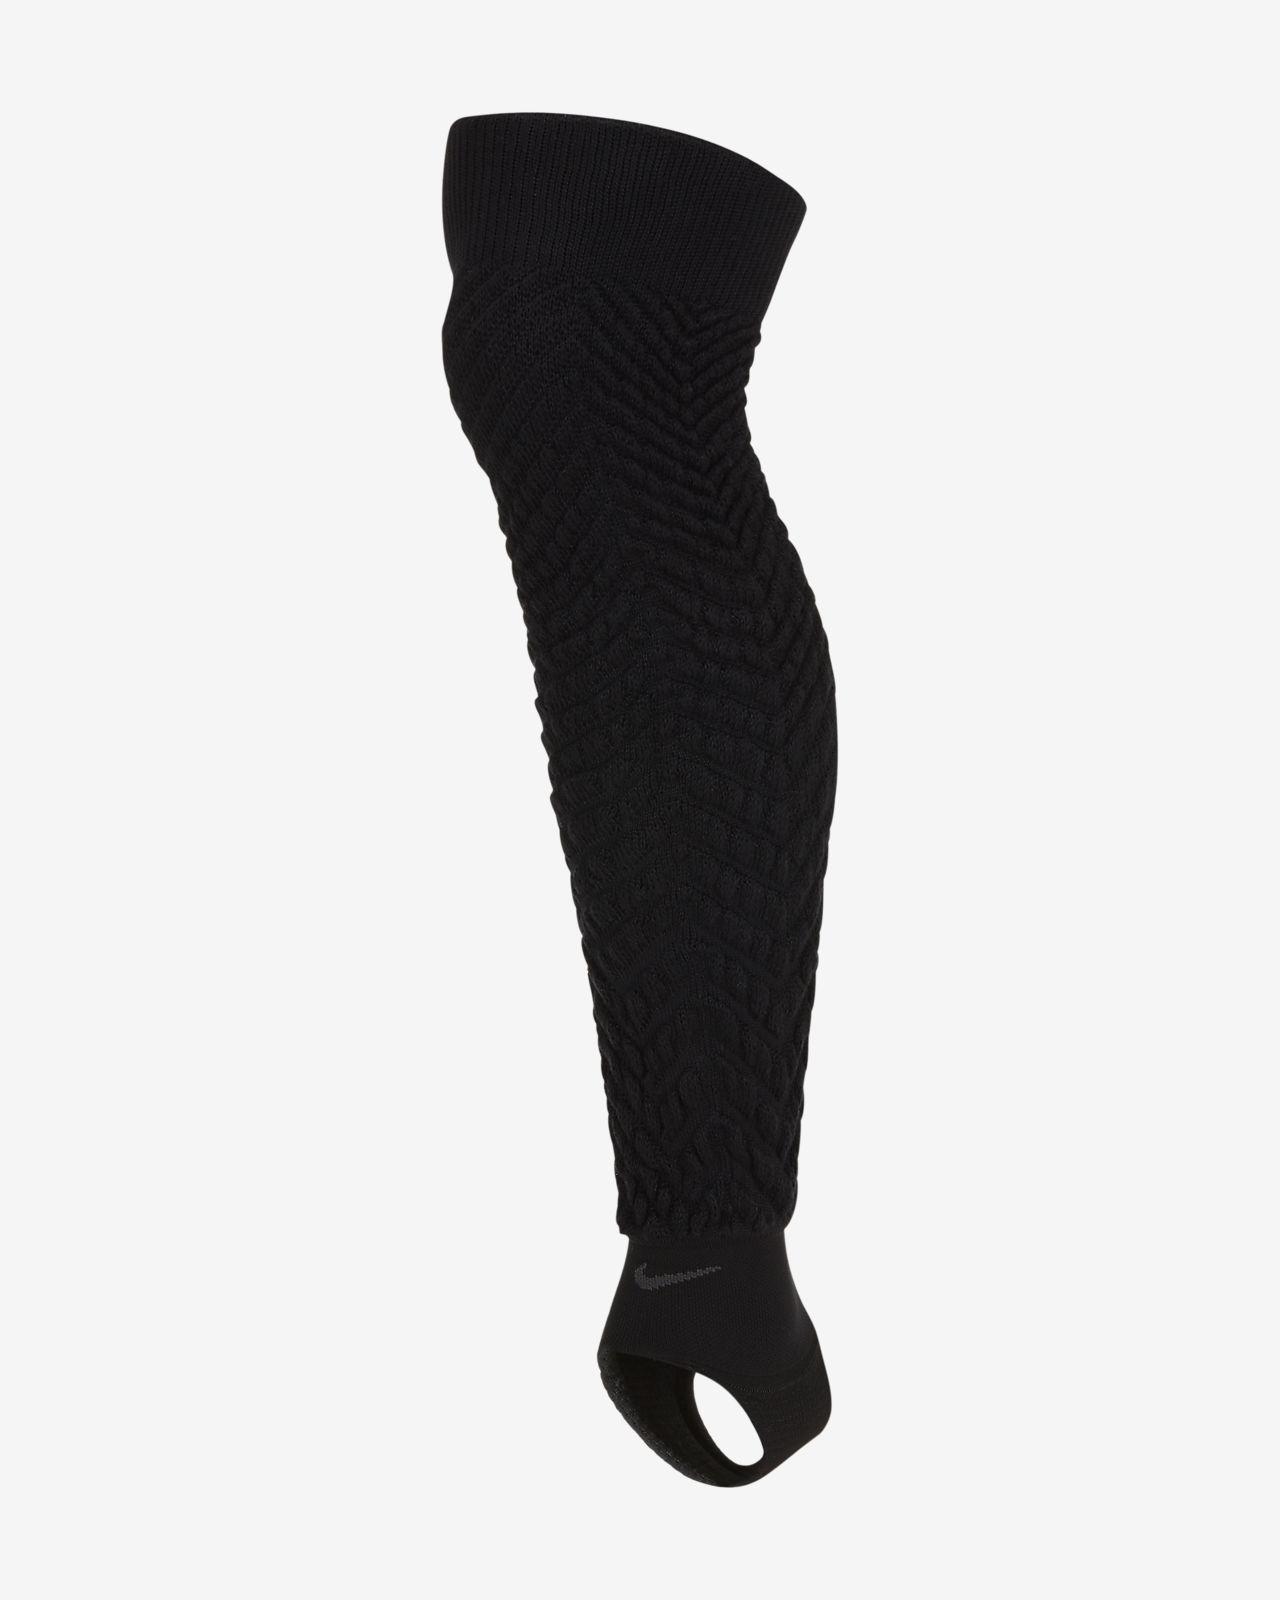 Nike Studio Women's Training Leg Warmers